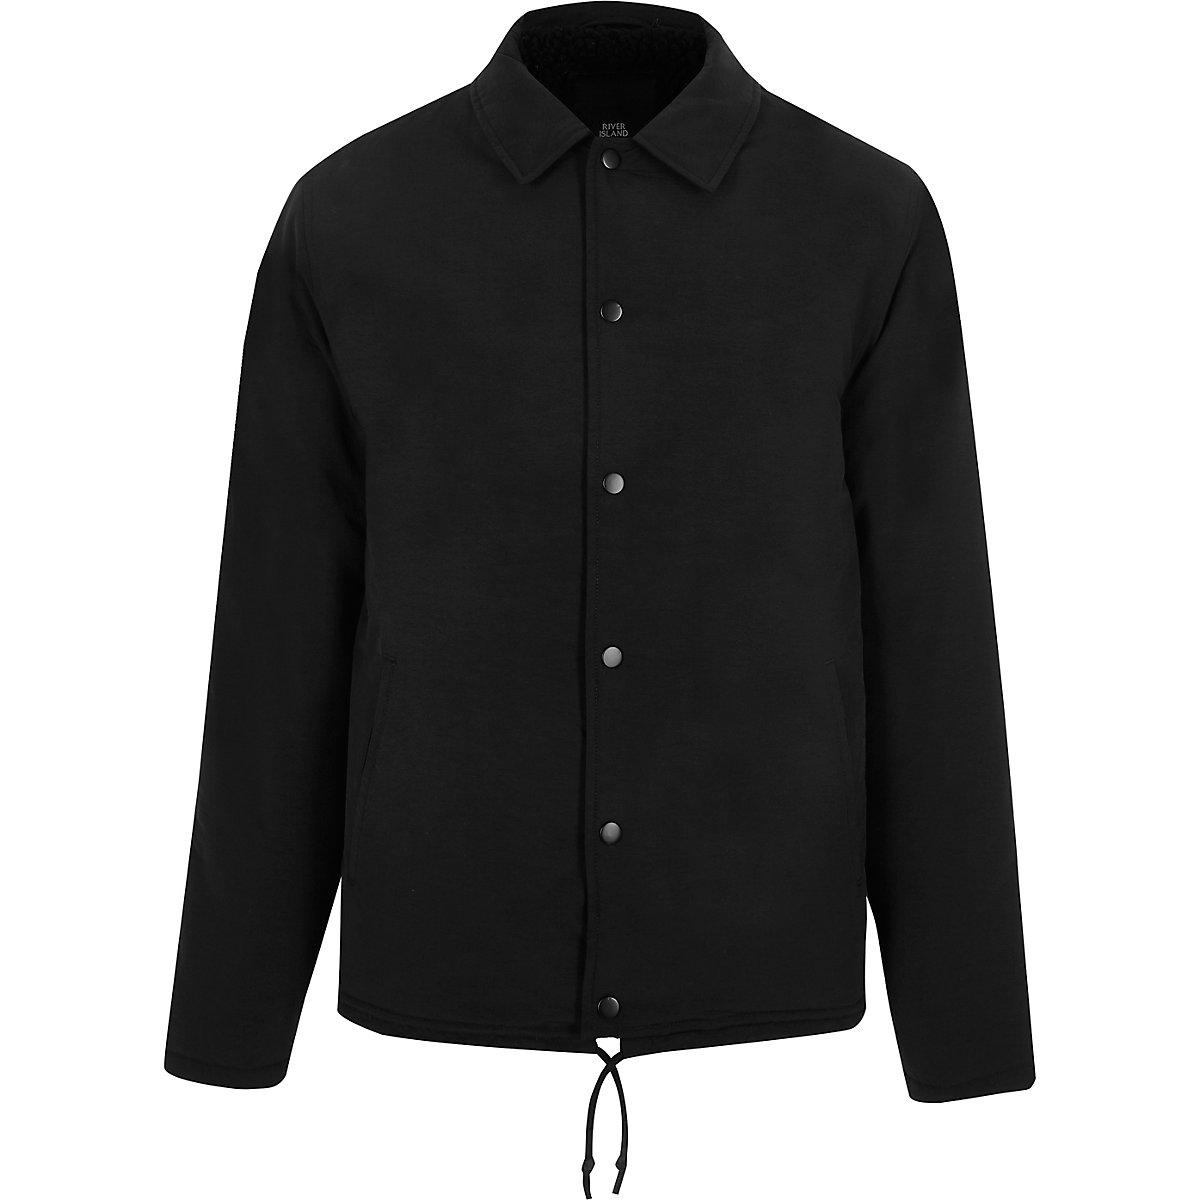 Black borg lined coach jacket